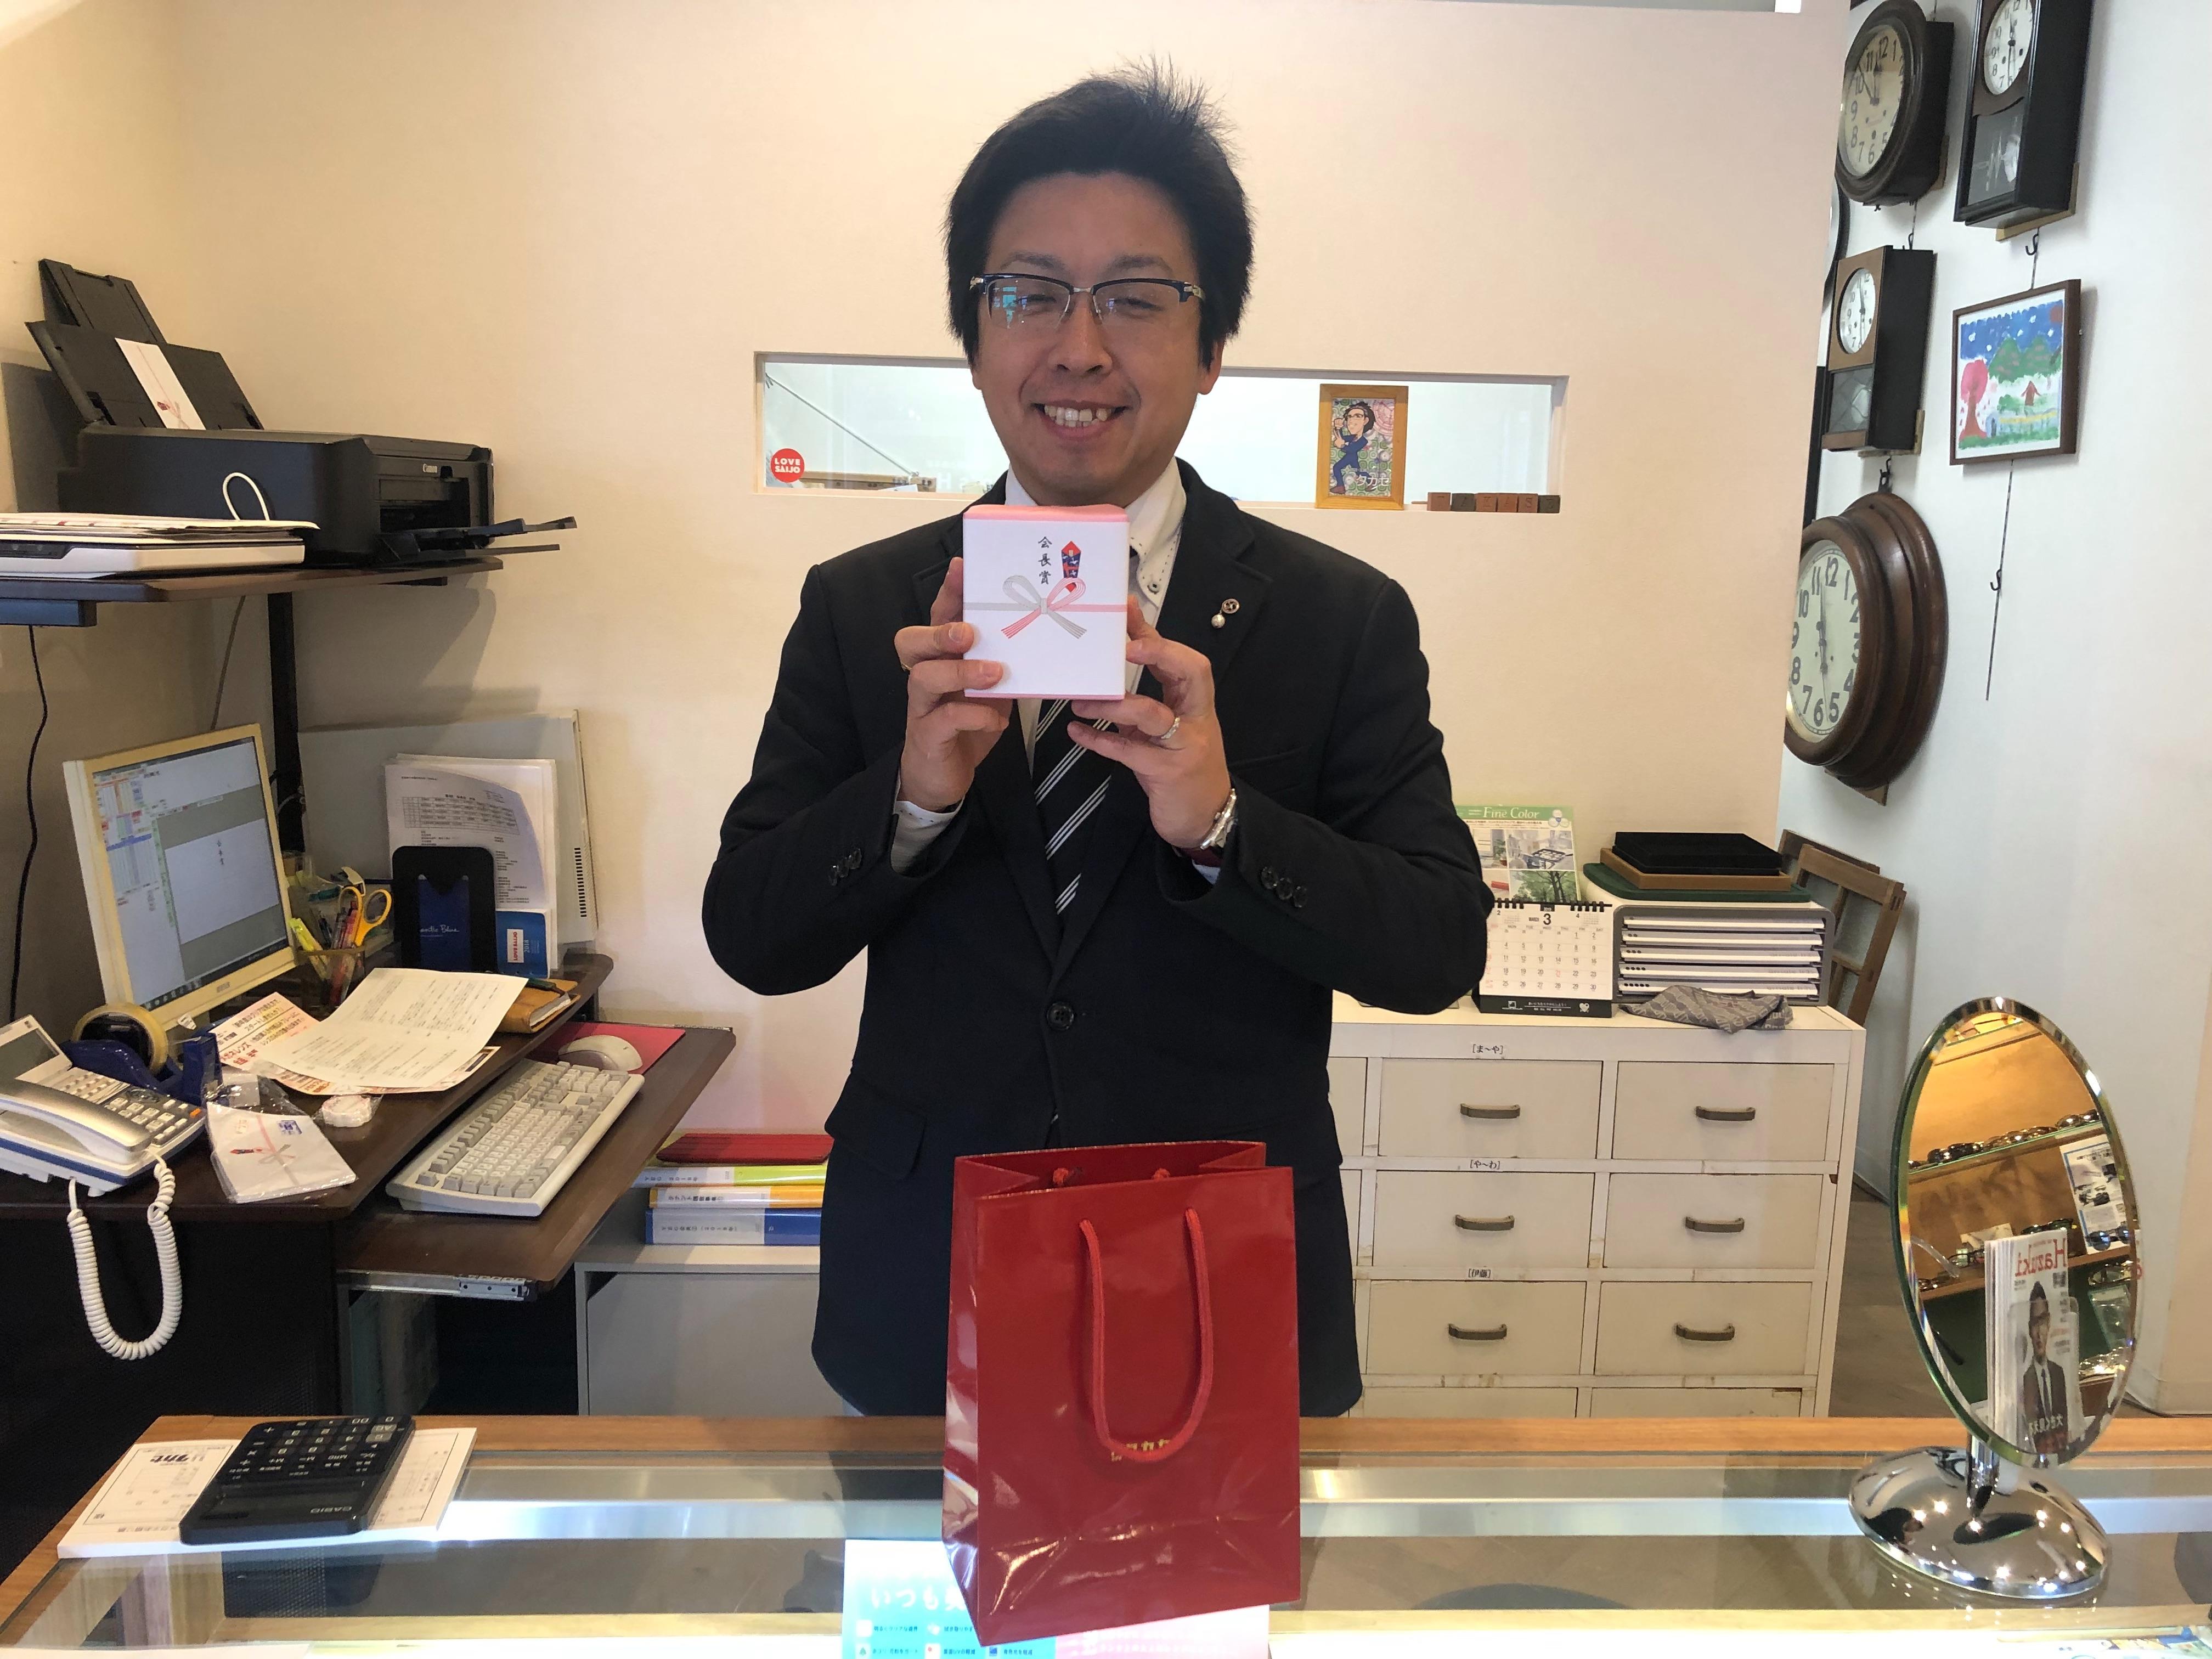 f:id:masanori-kato1972:20190325115848j:image